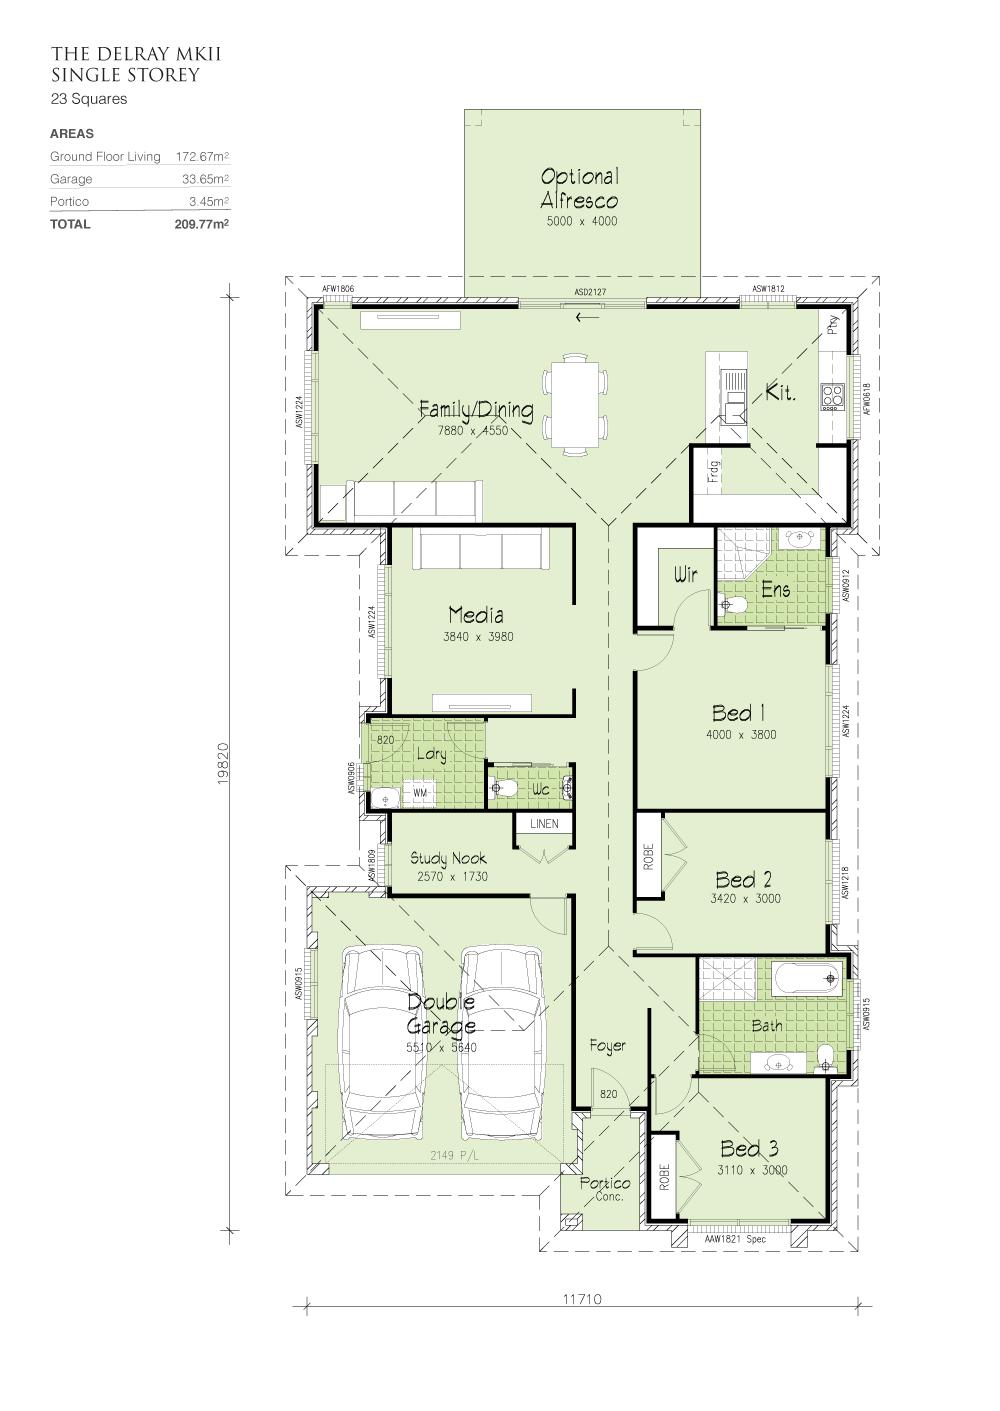 Delray MKII - No Split , Home Design, Tullipan Homes